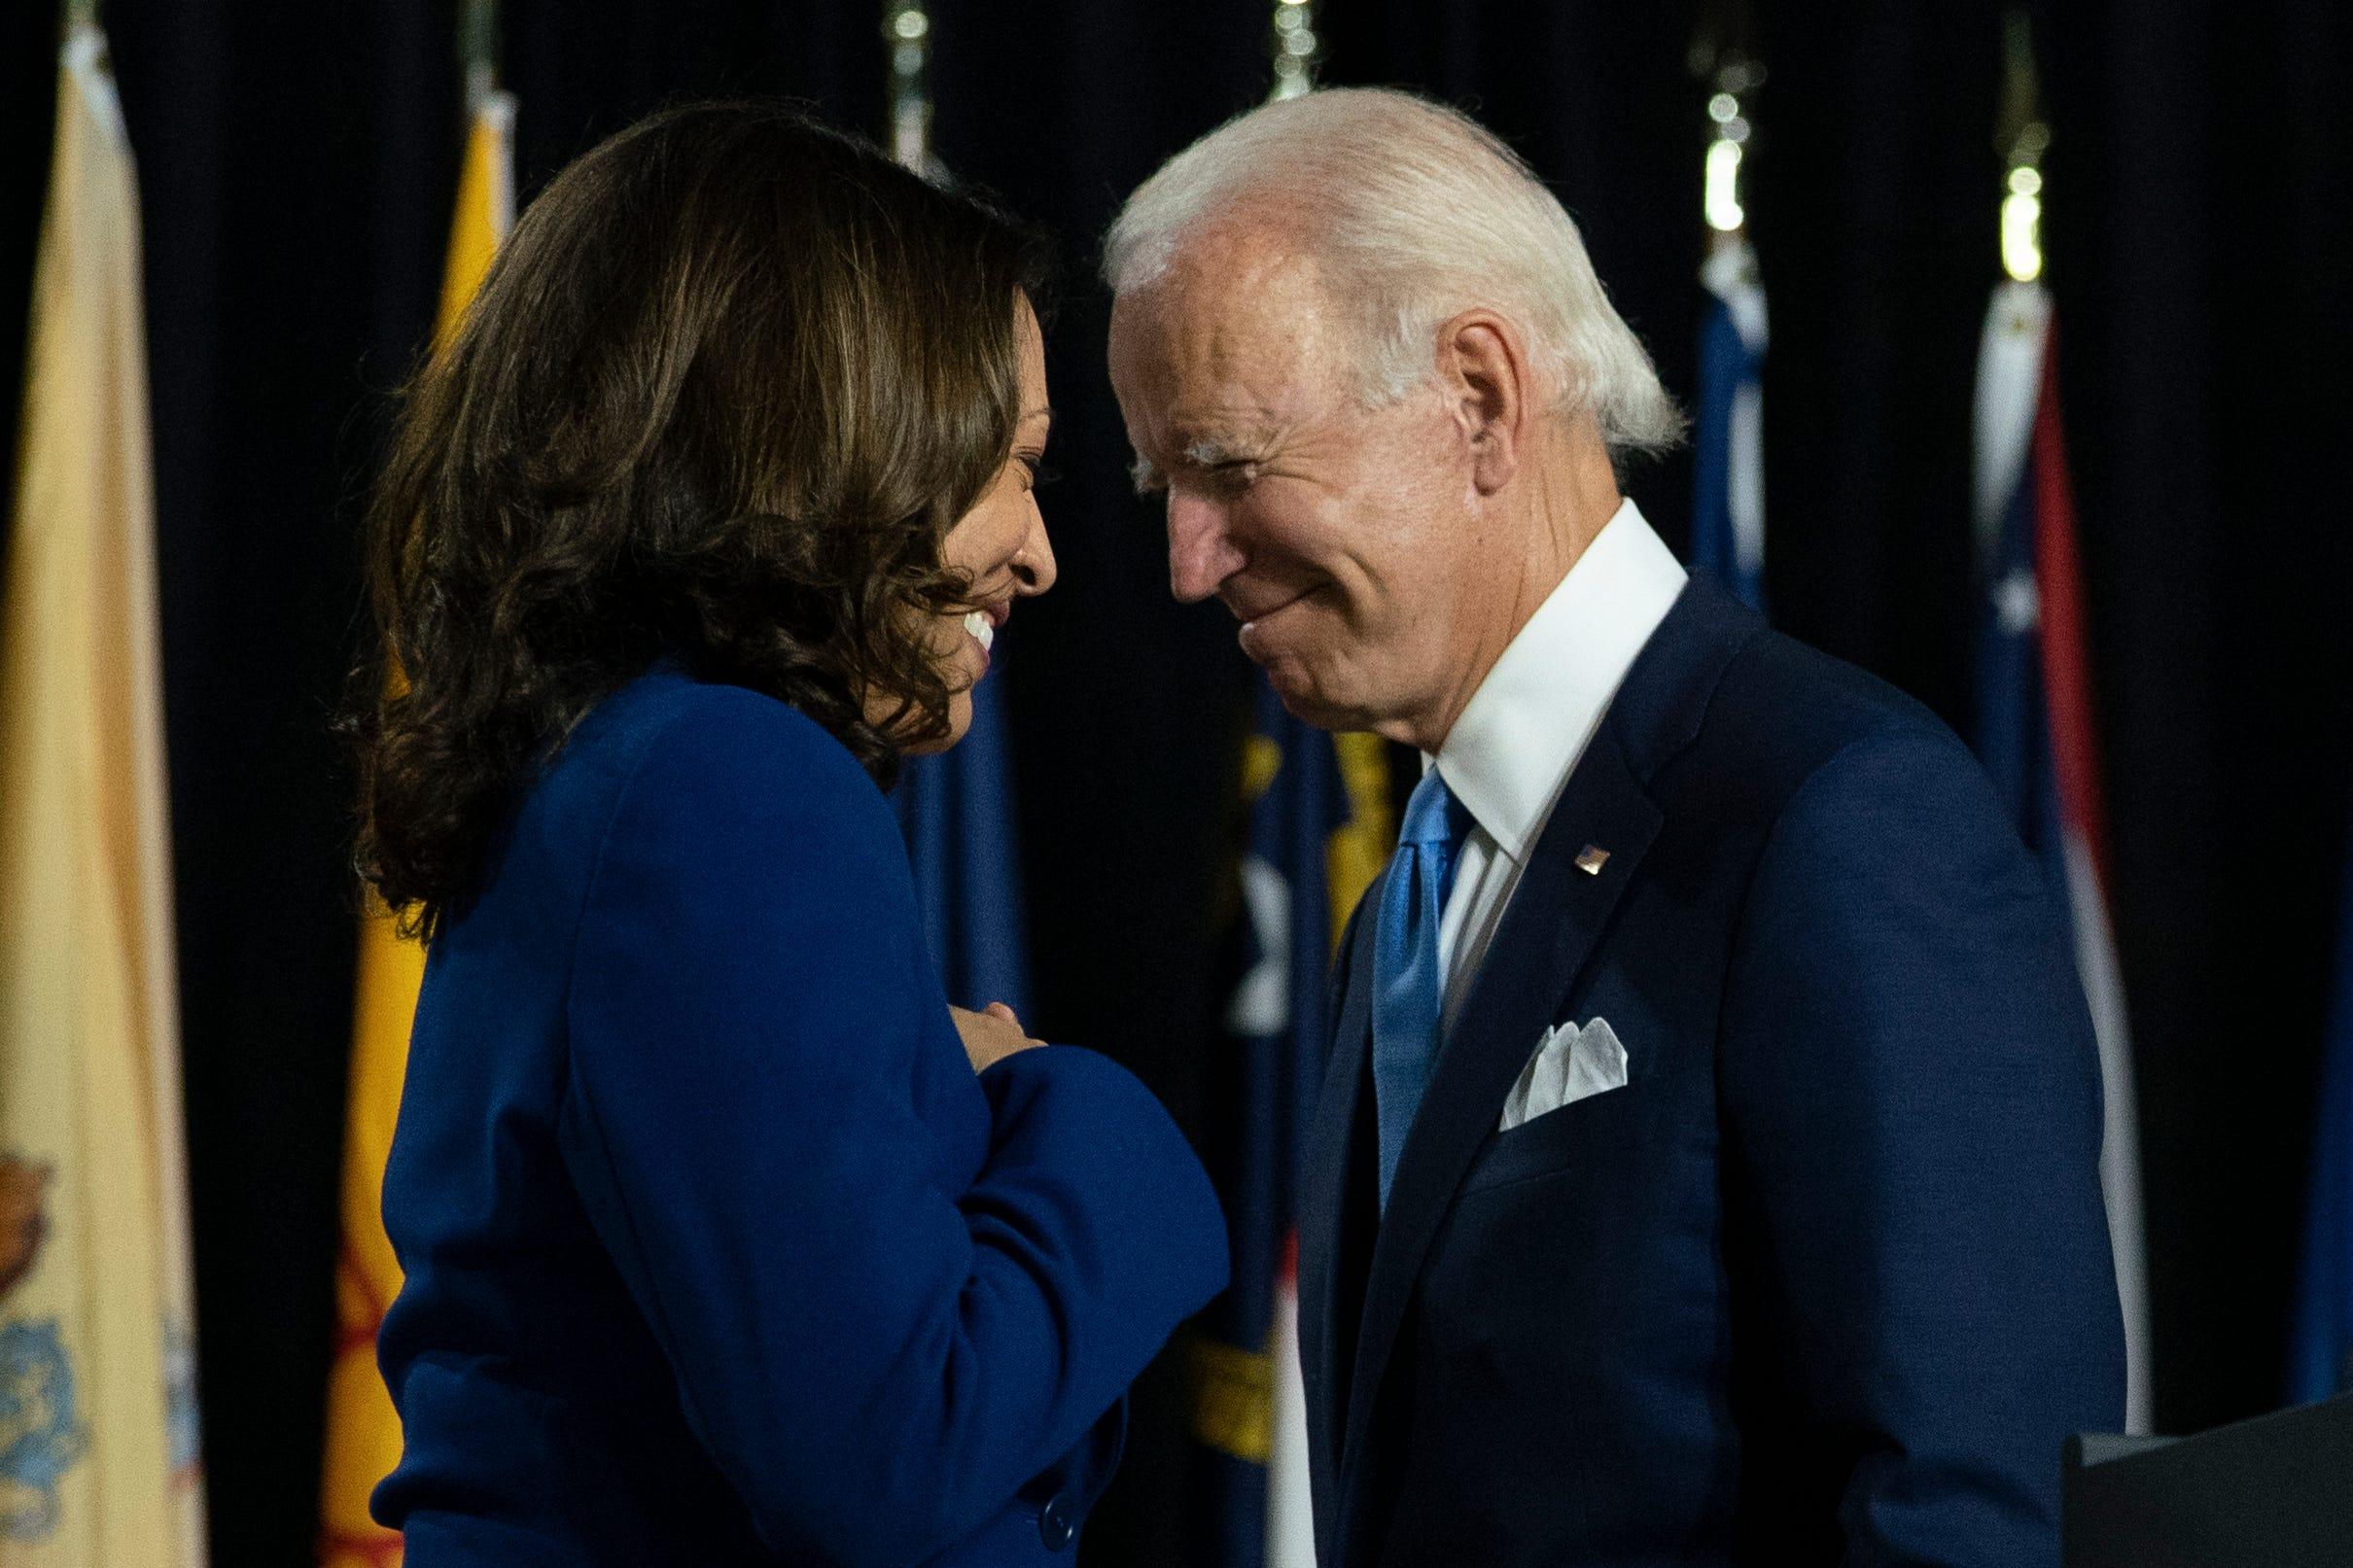 Joe Biden Kamala Harris To Make Campaign Appearance In Arizona